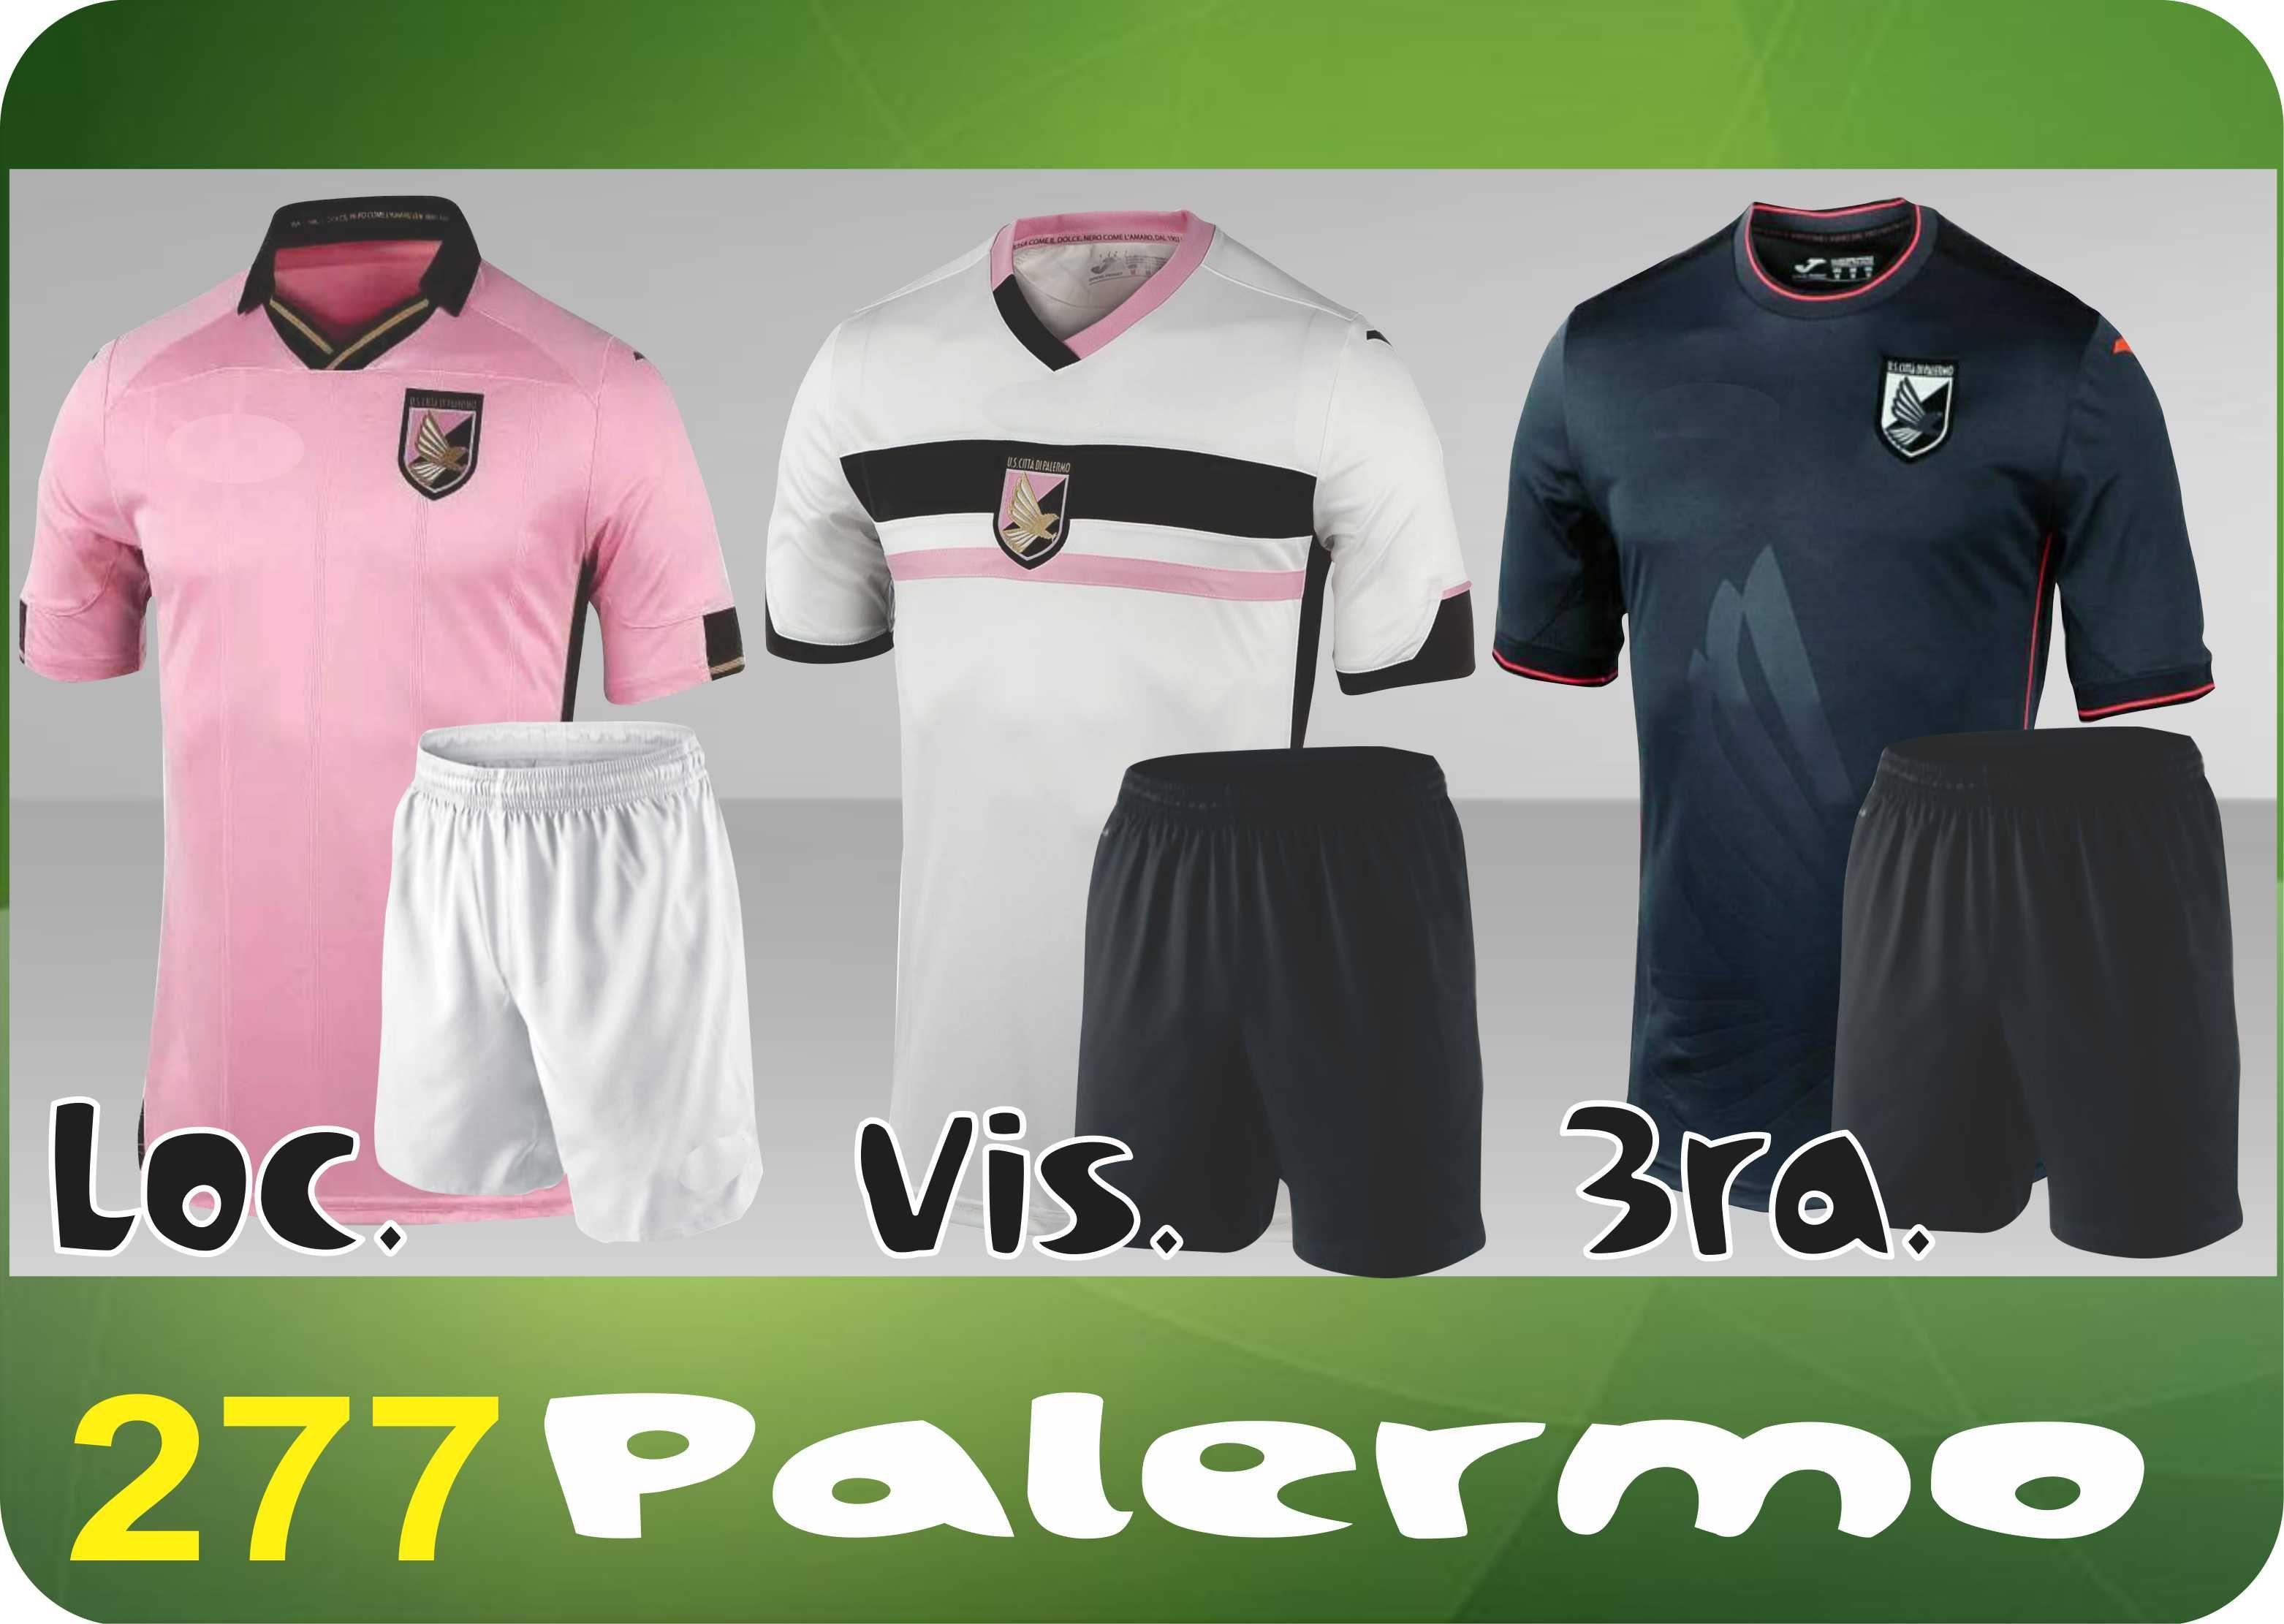 UNIFORME SOCCER DRI FIT. Mod. 277 PALERMO Uniformes De Futbol d62e40ae393